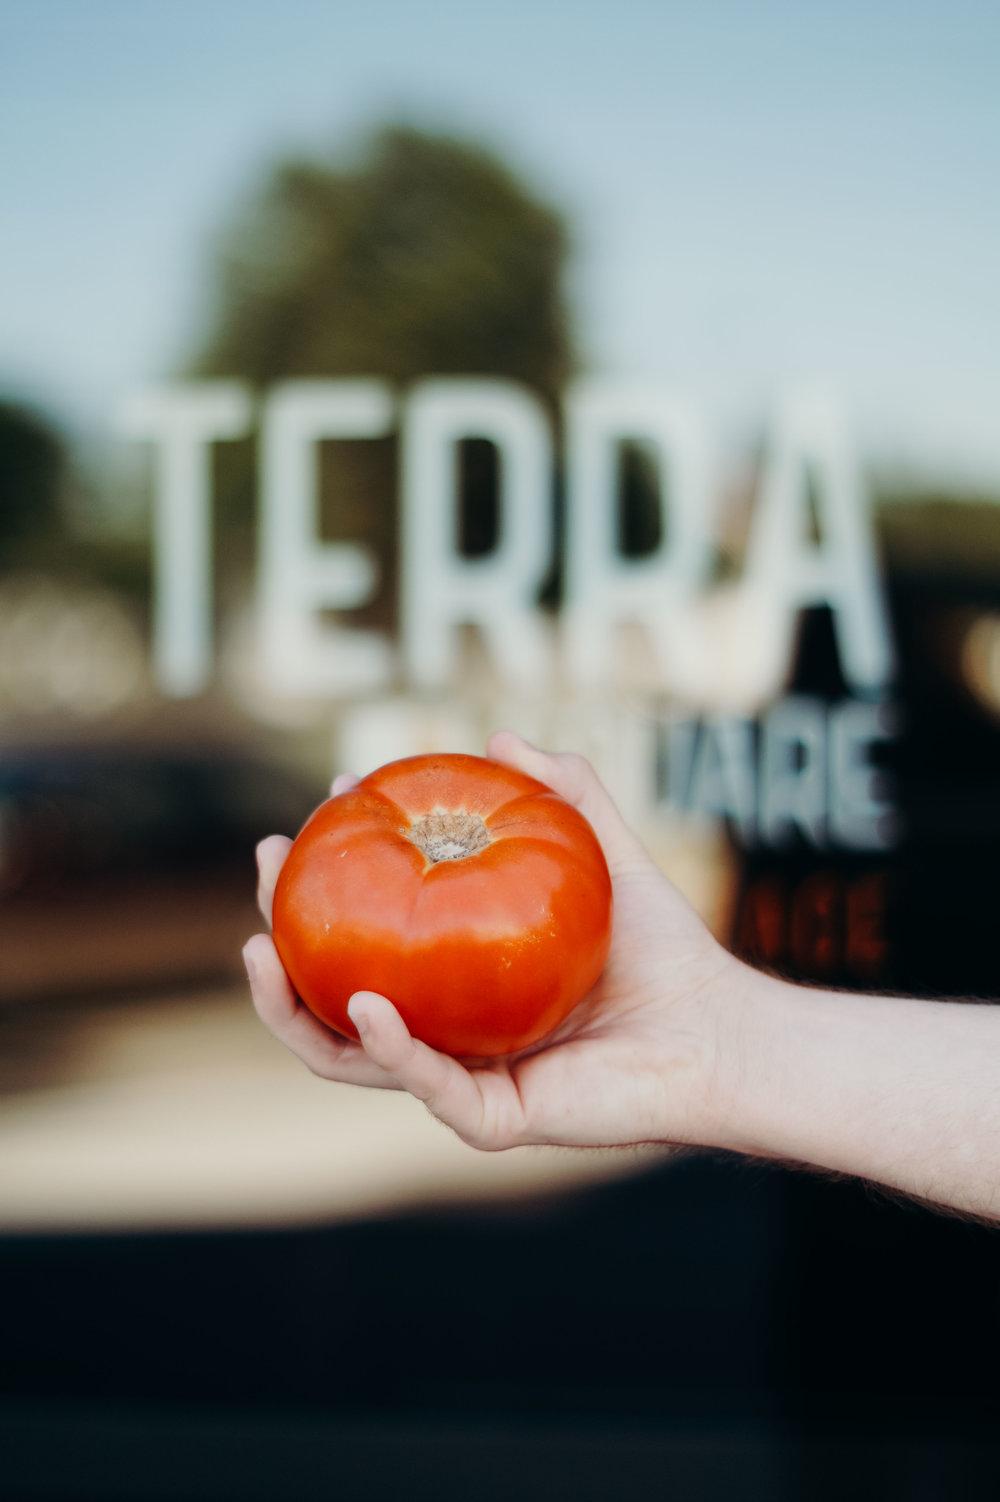 Wendling_Boyd_Terra_Square_Farmers_Market-6.jpg